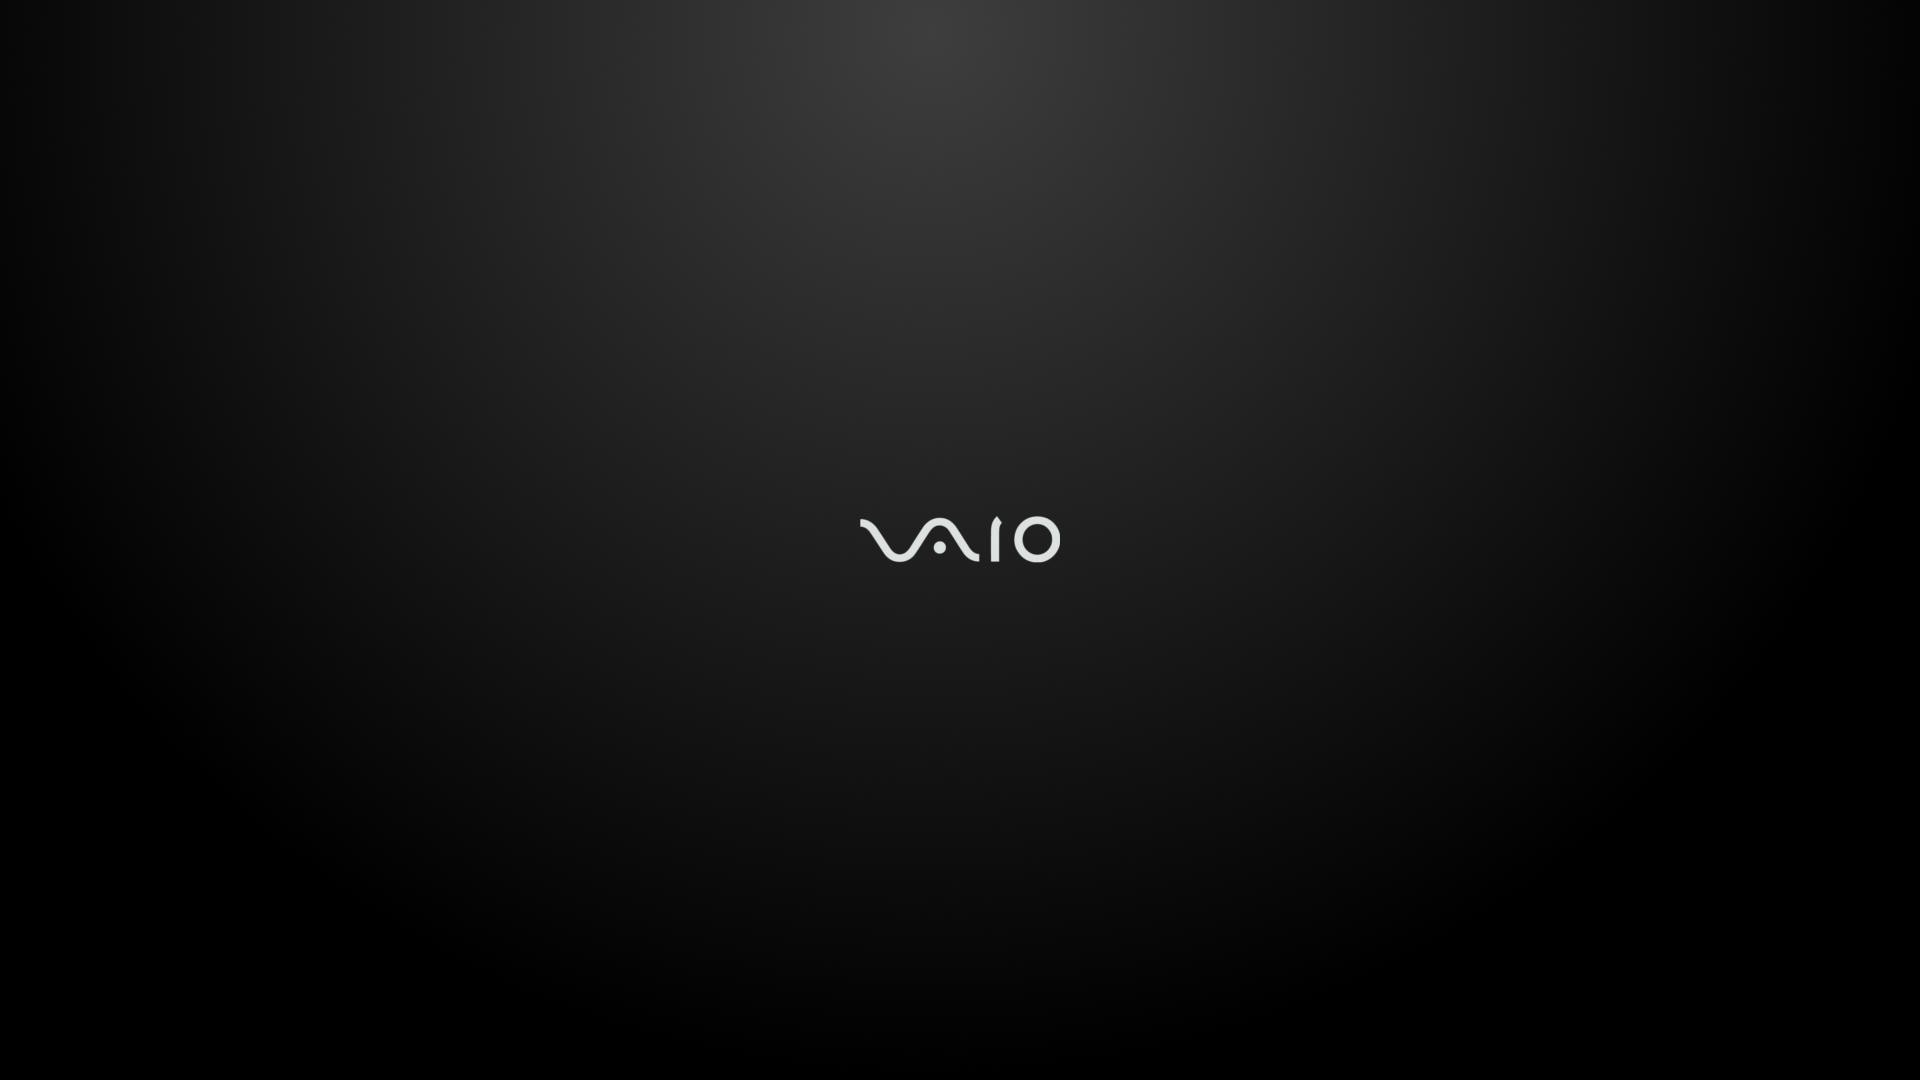 Vaio wallpaper 1920x1080 67 images for Sfondi vaio